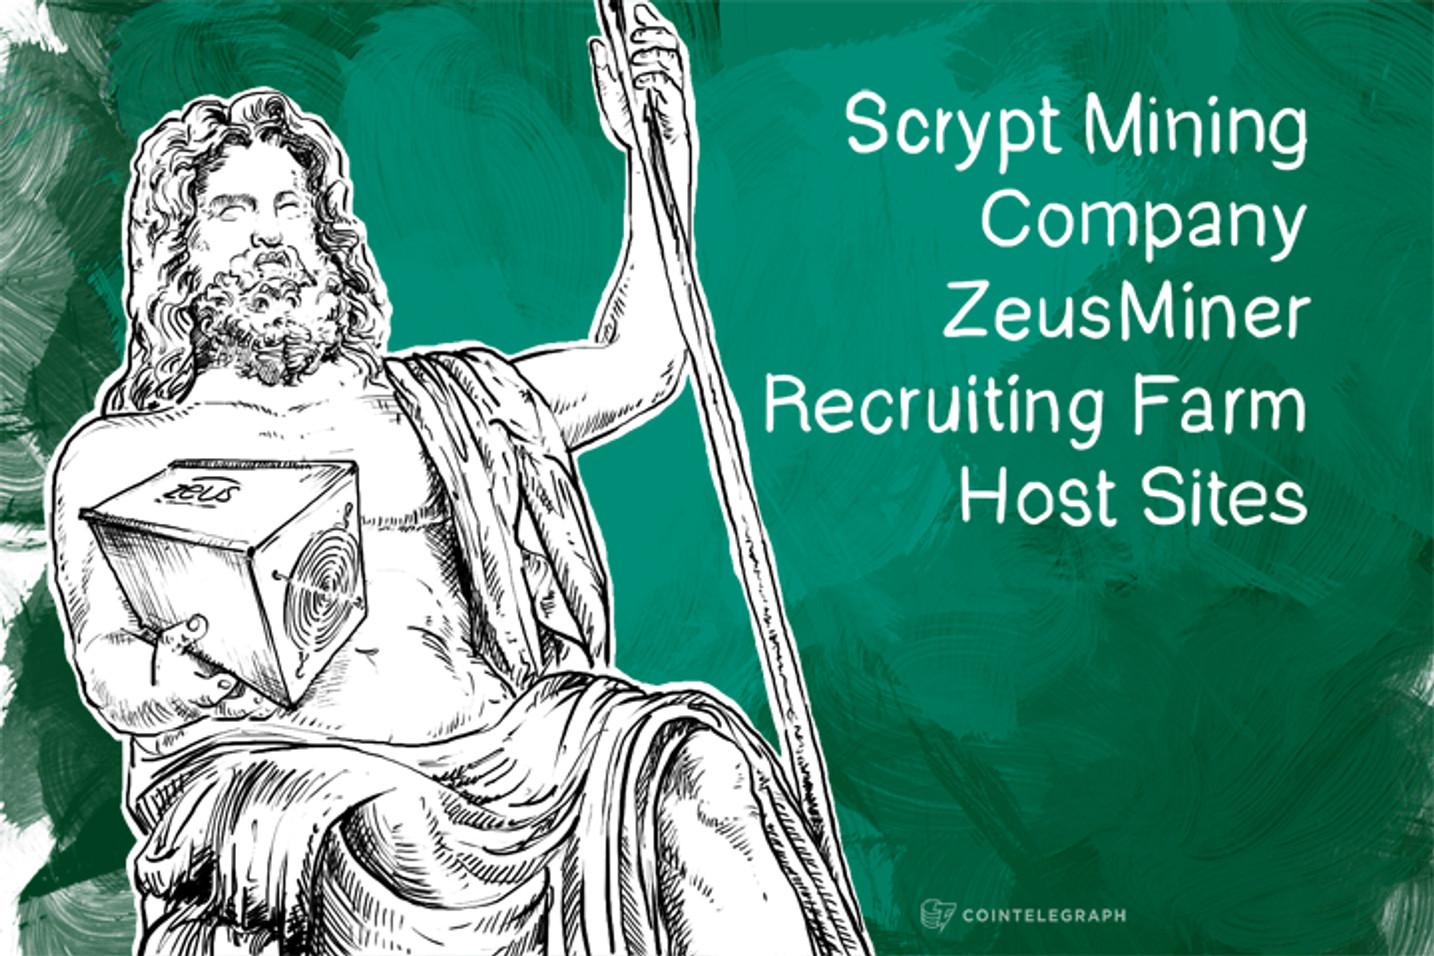 Scrypt Mining Company ZeusMiner Recruiting Farm Host Sites